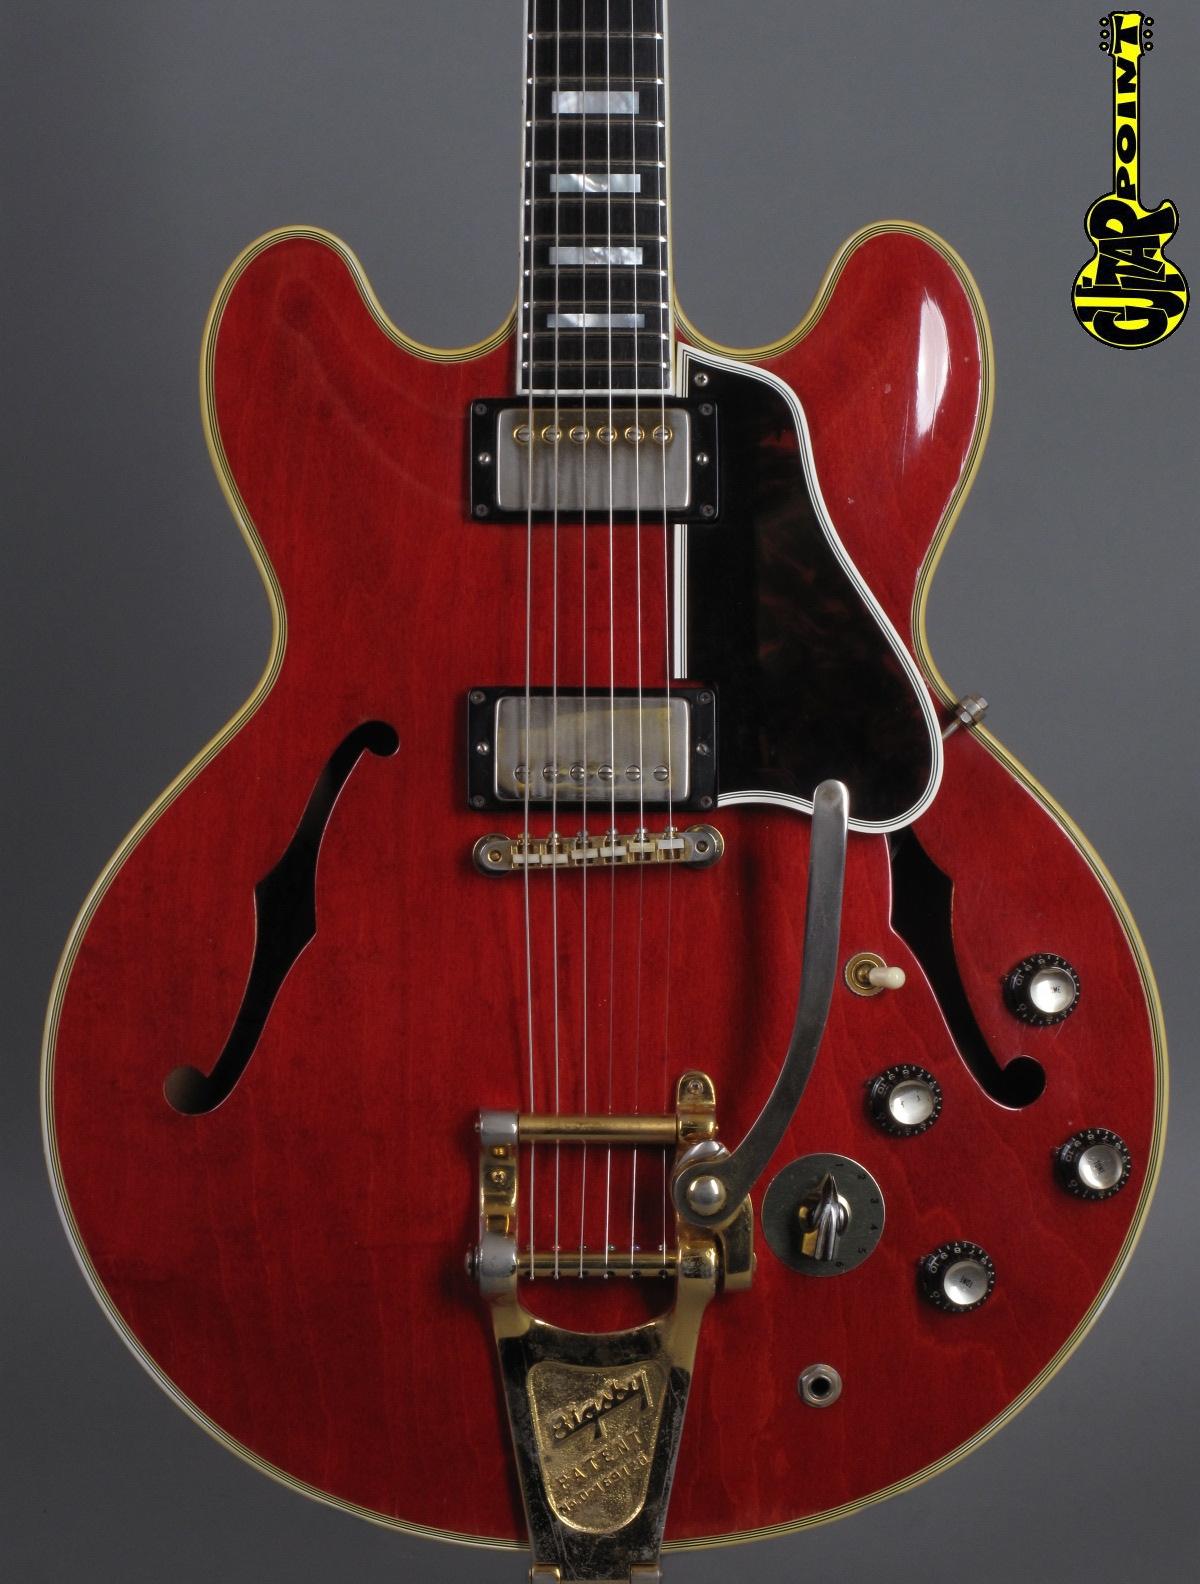 1963 Gibson ES-355 TDSV / Stereo - Cherry